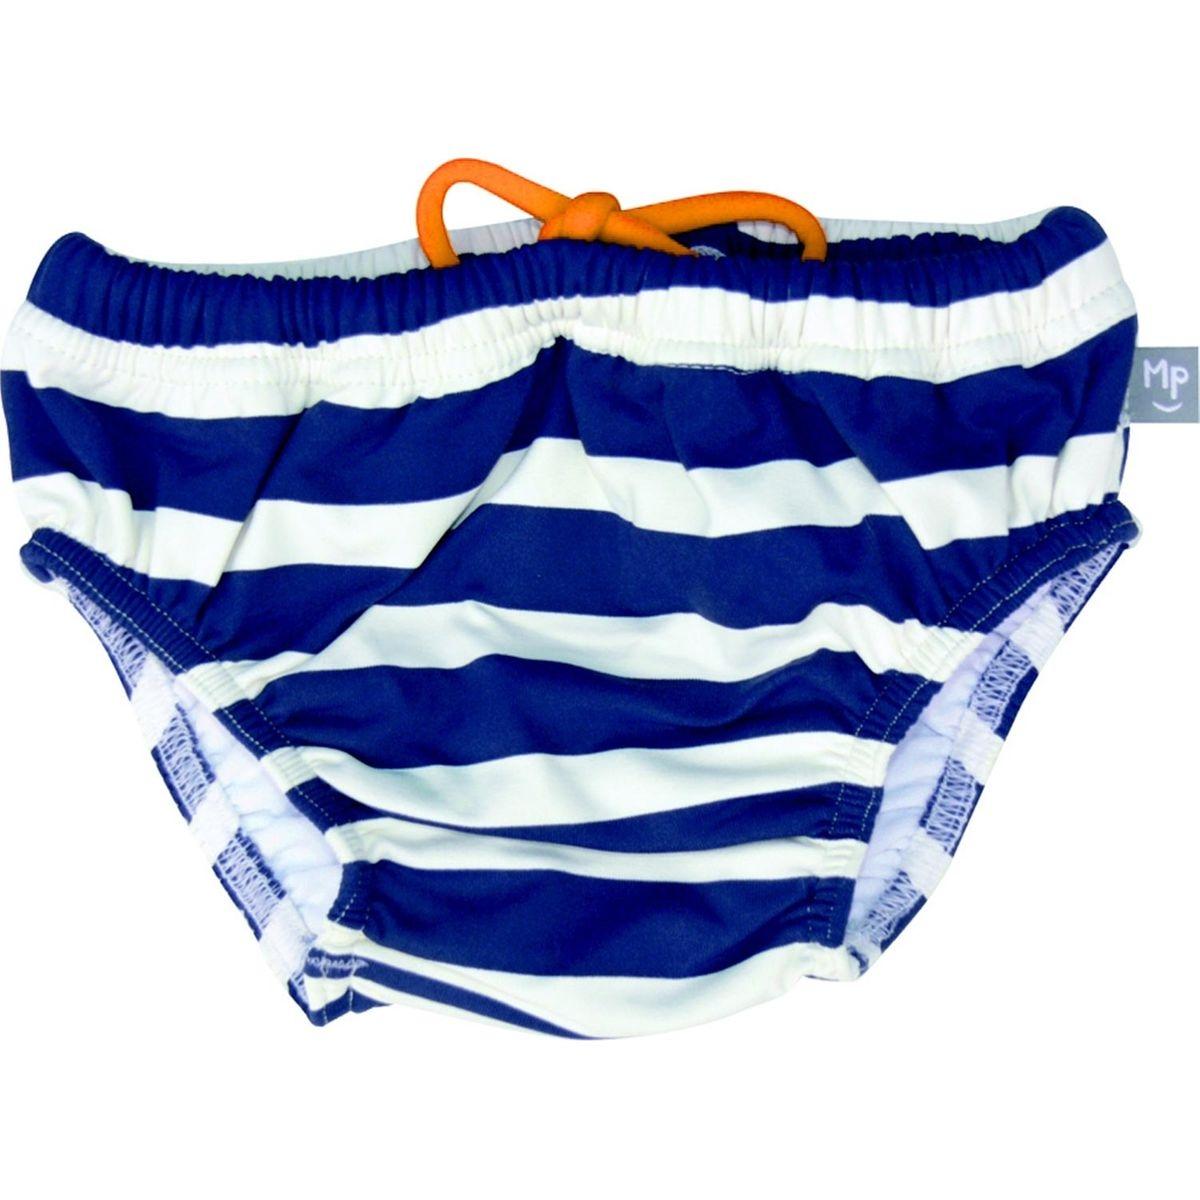 Marinou Fluo   Culotte maillot couches antifuites